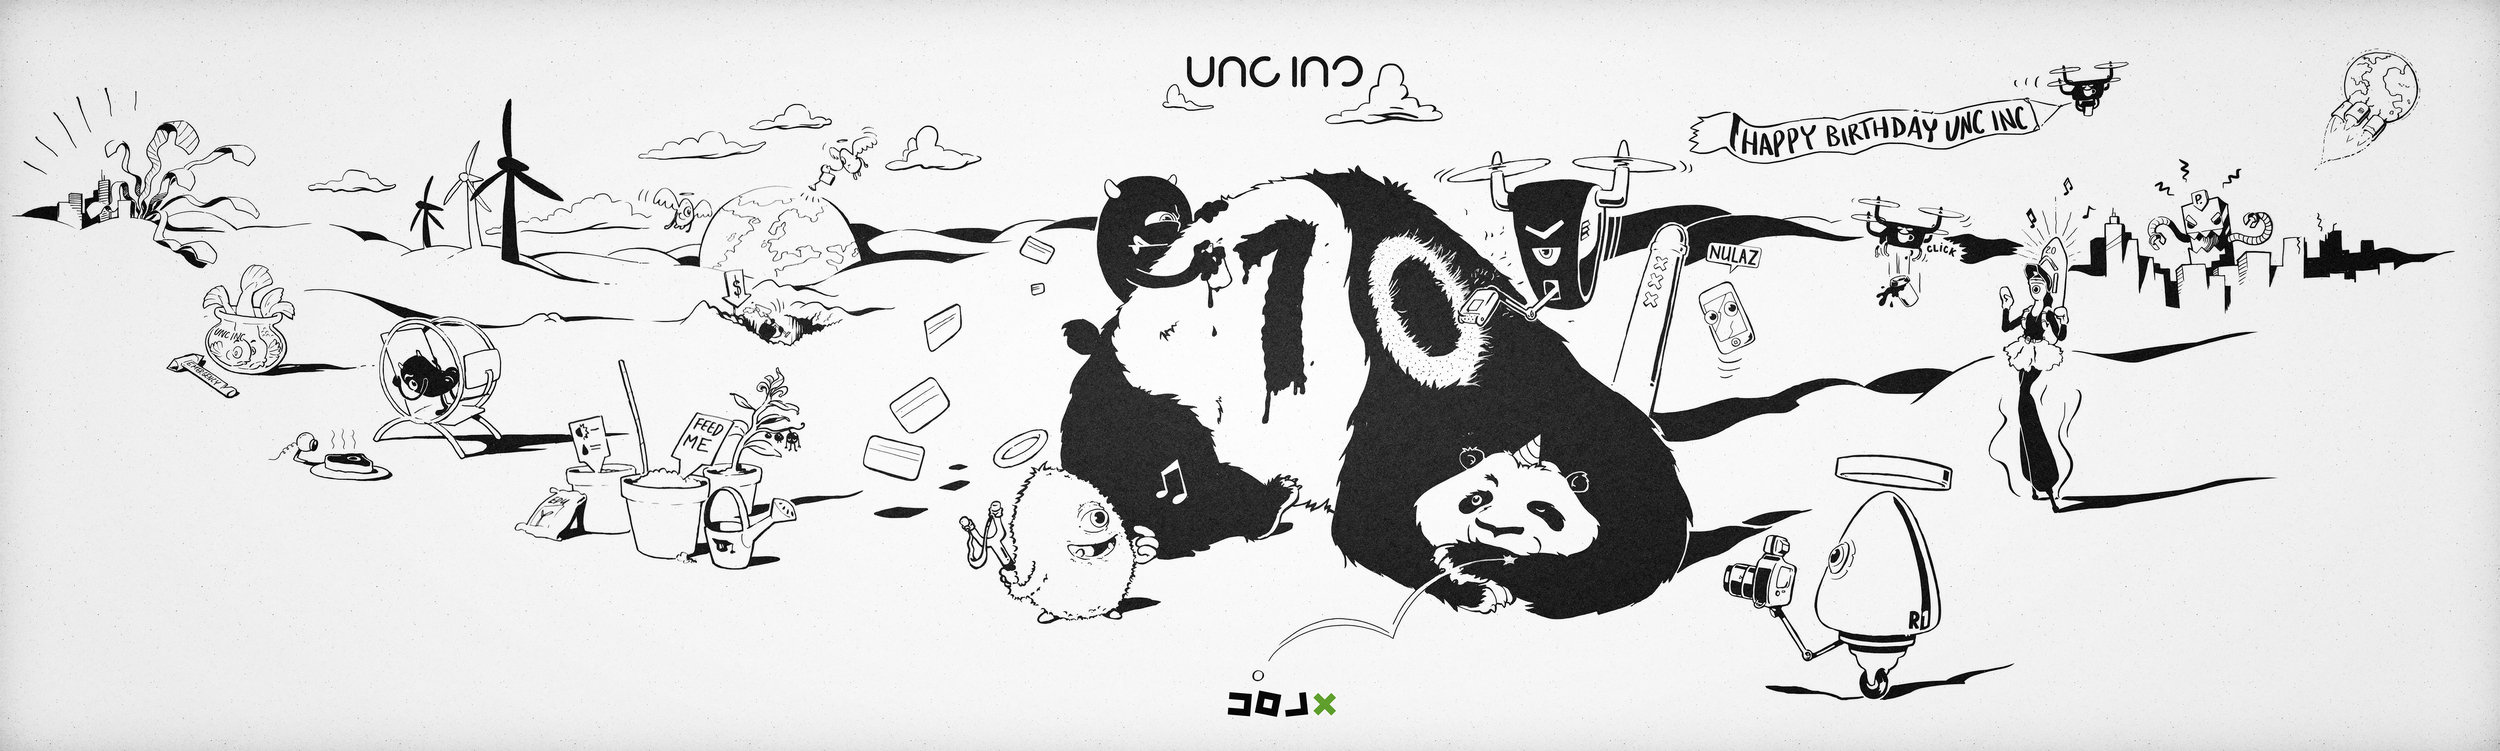 10YEARS UNCINC-V1.jpg